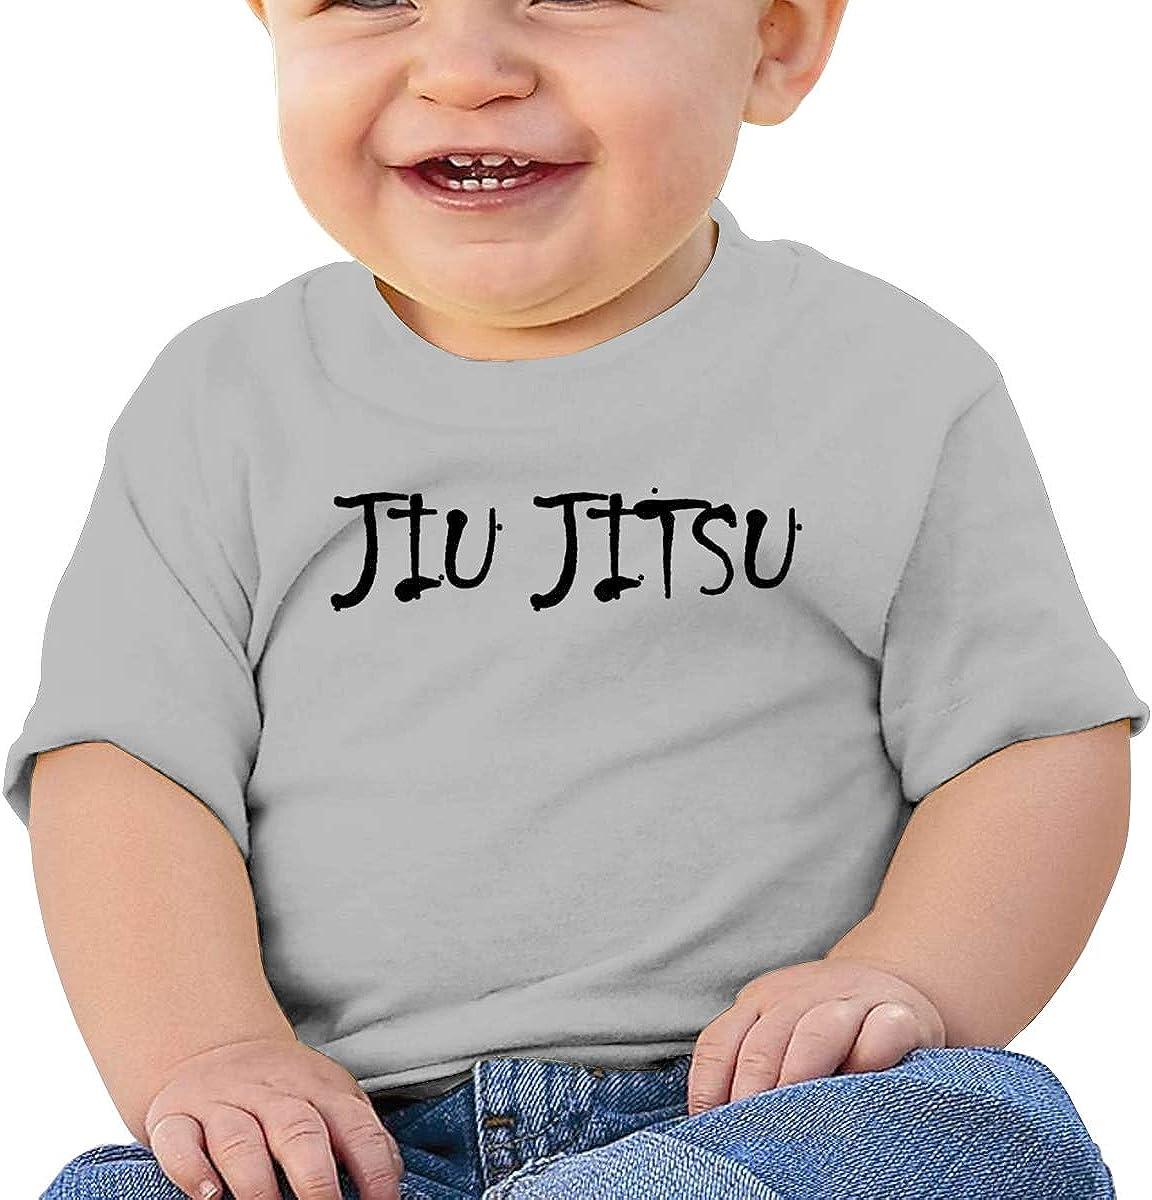 Negi Jiu Jitsu 1 Cotton Infant Girls T-Shirts Short Sleeve